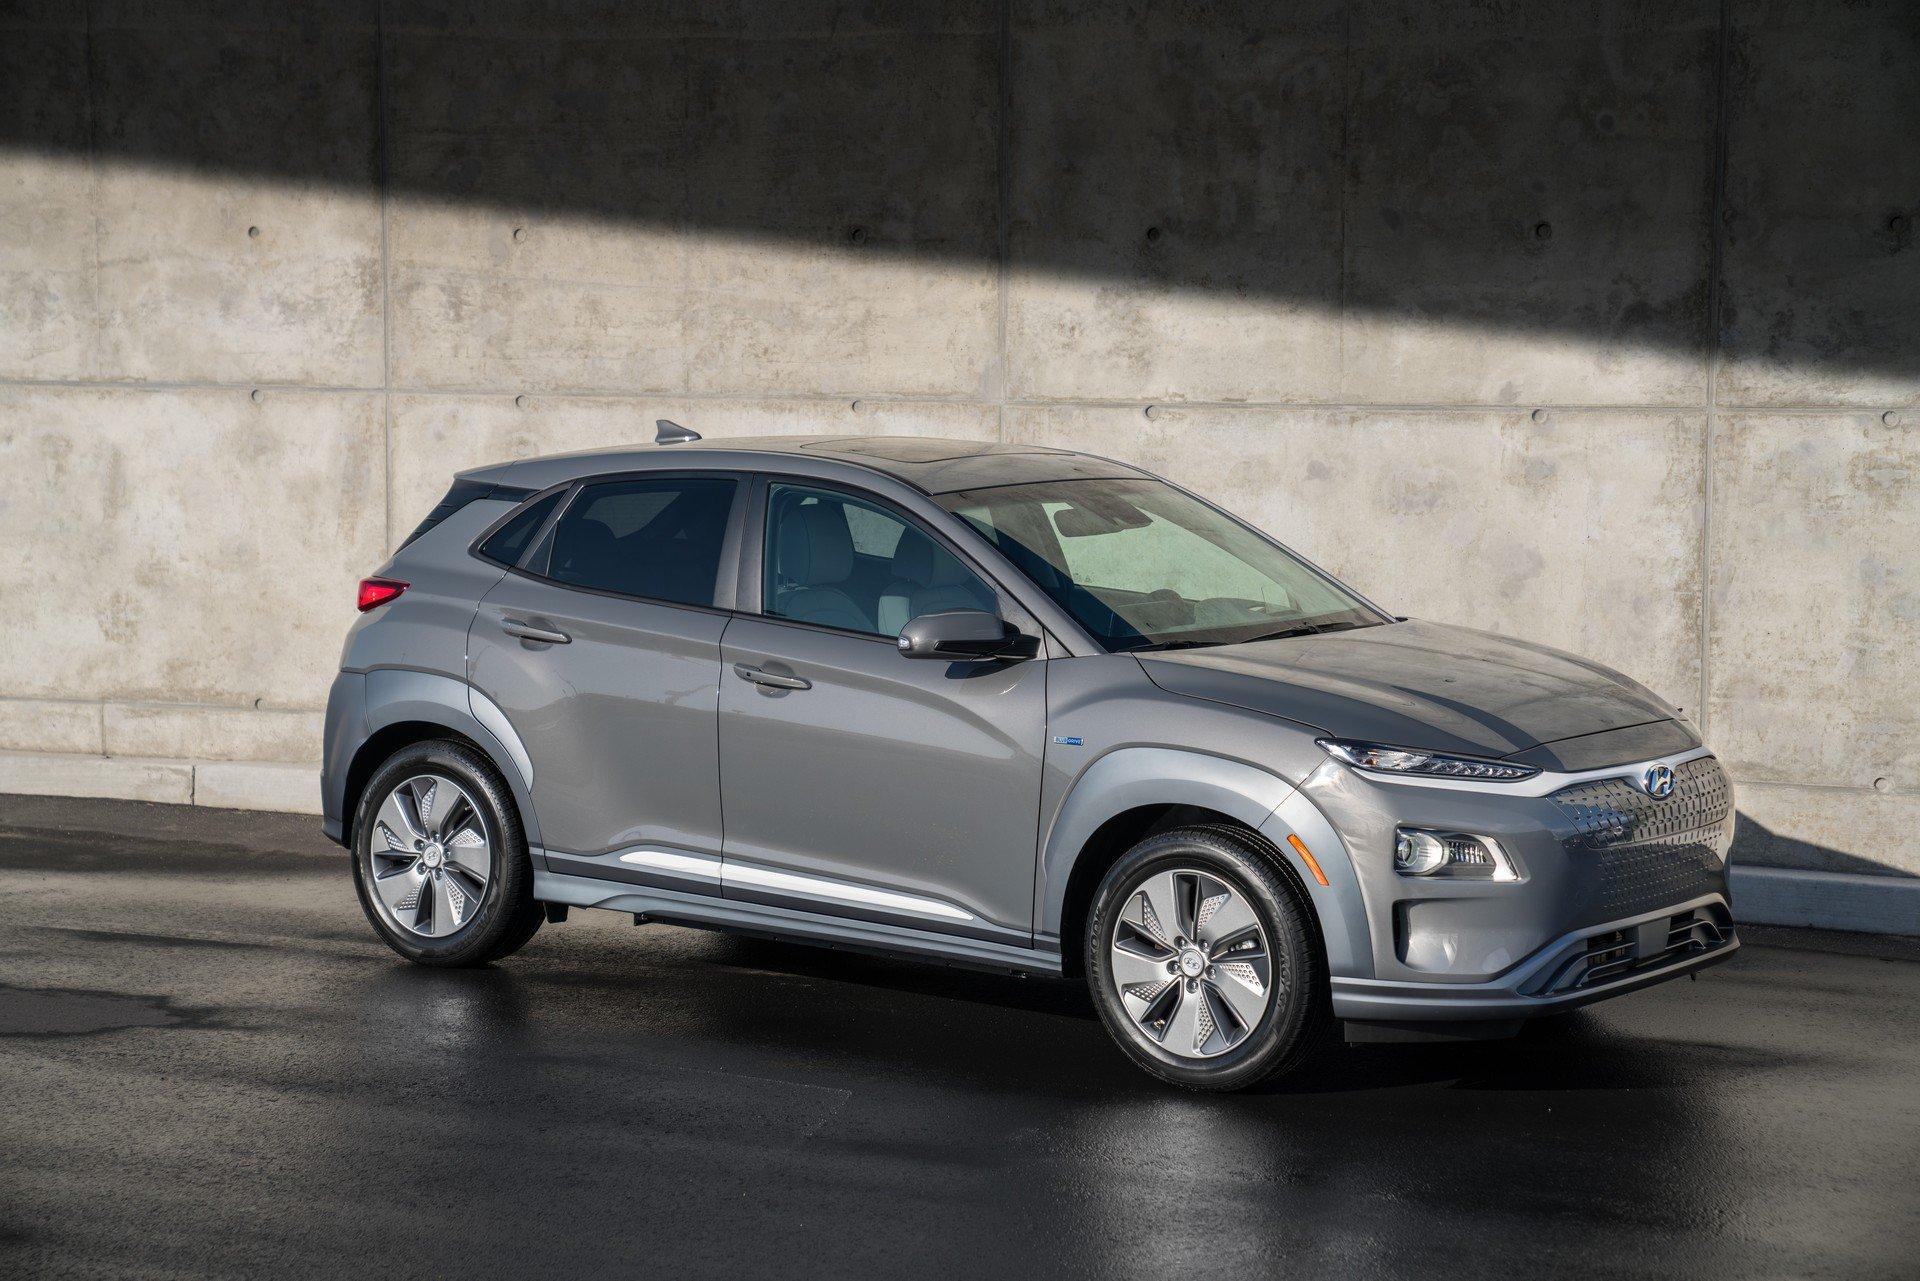 2019_Hyundai_Kona_Electric_0005